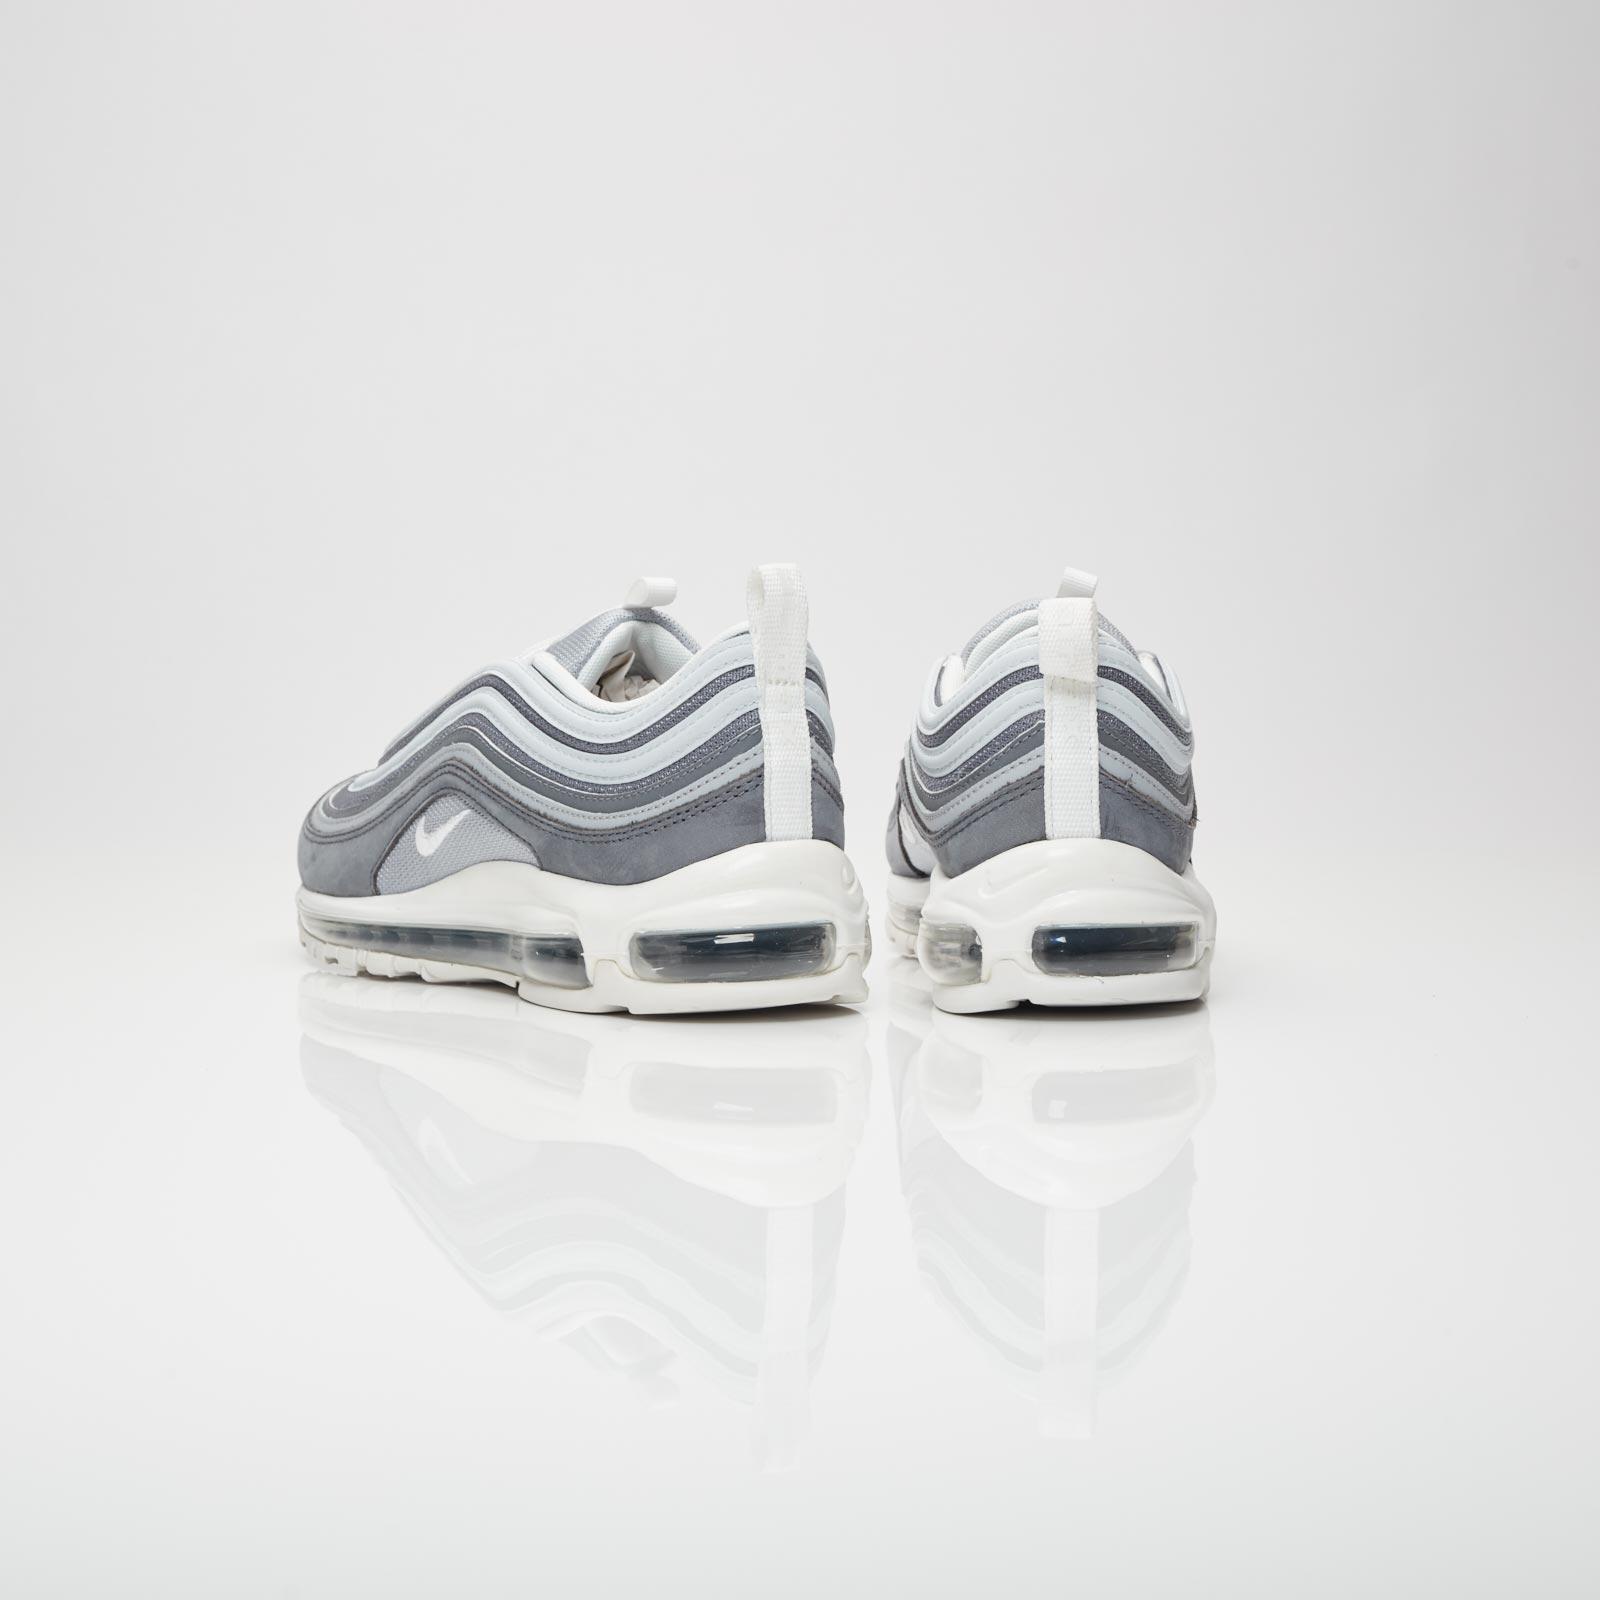 quality design 3e658 b0cbd Nike Air Max 97 Premium - 312834-005 - Sneakersnstuff   sneakers    streetwear online since 1999